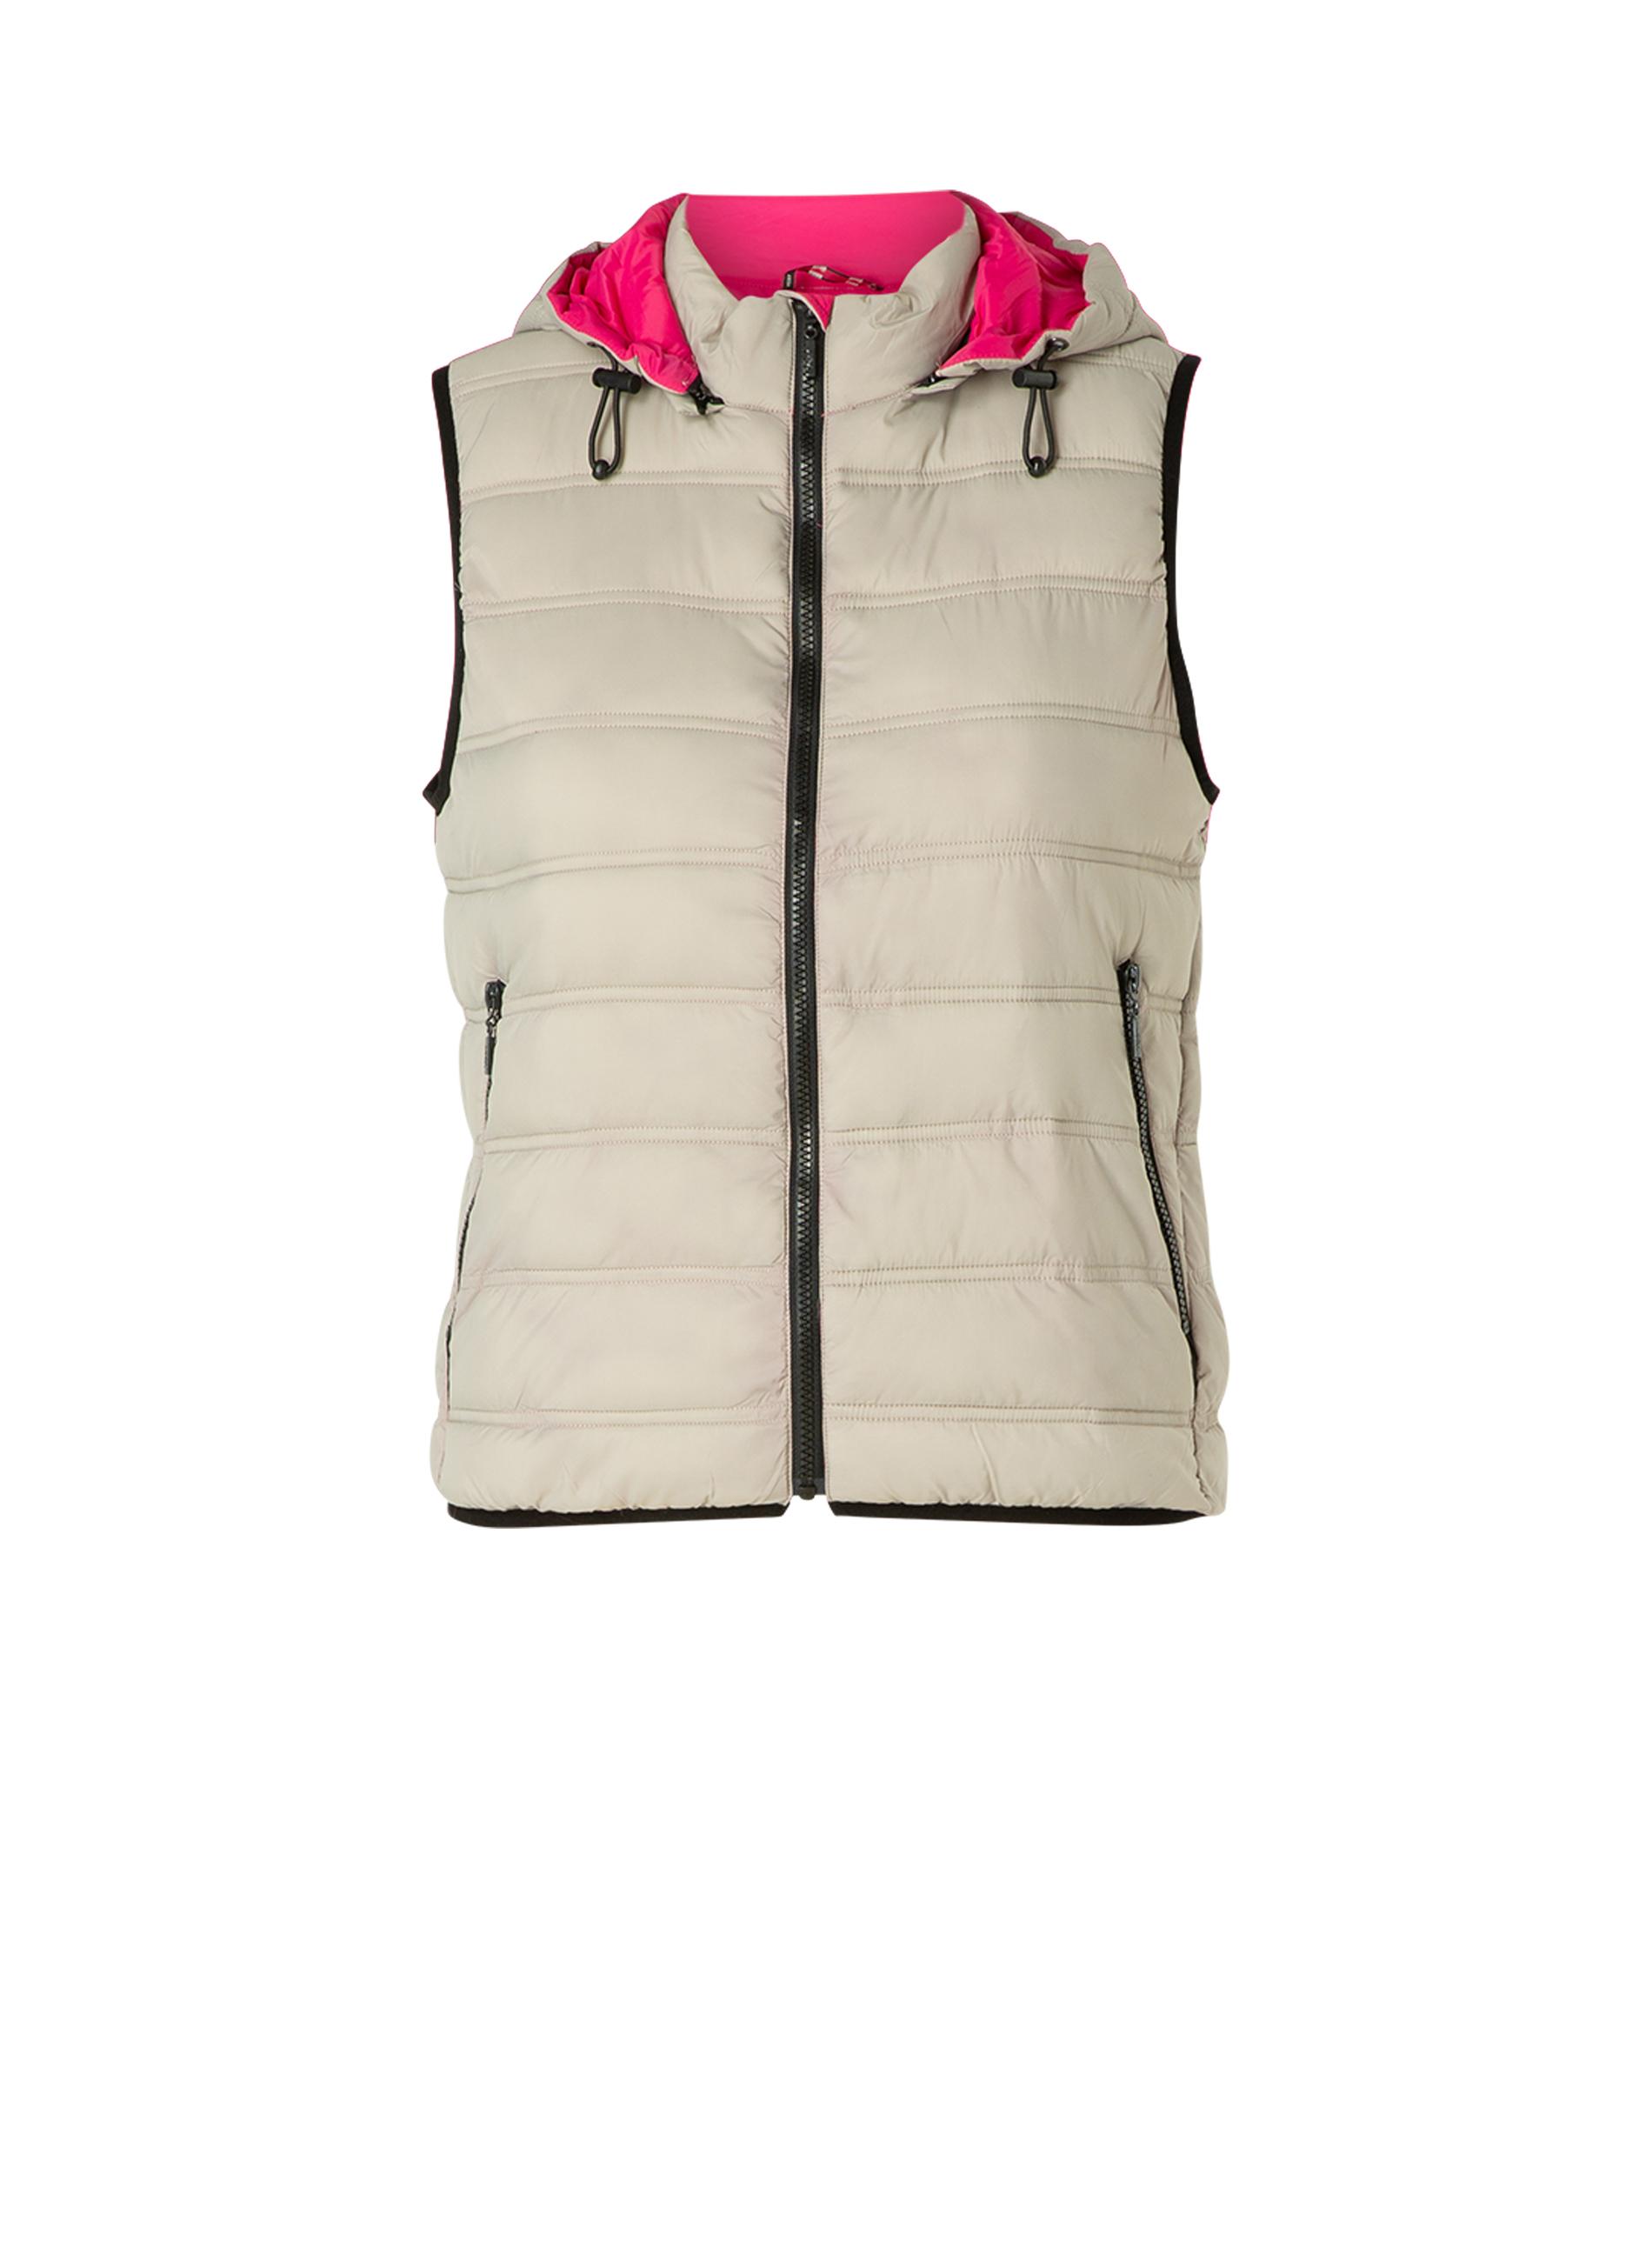 Yest Bodywarmer Summer Outerwear 60